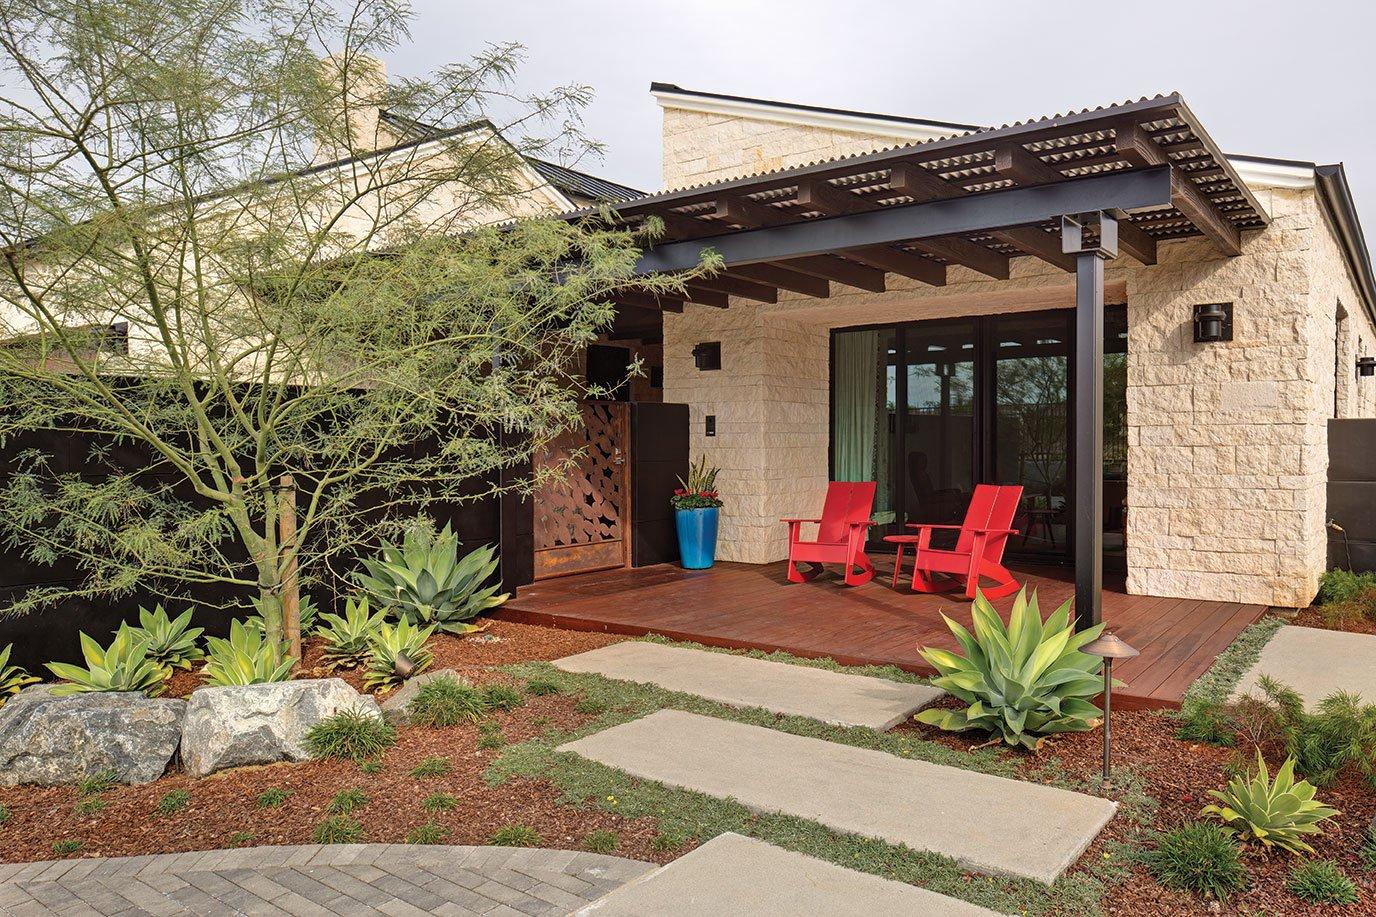 Texas in California San Diego low water garden solar panels adirondack chairs